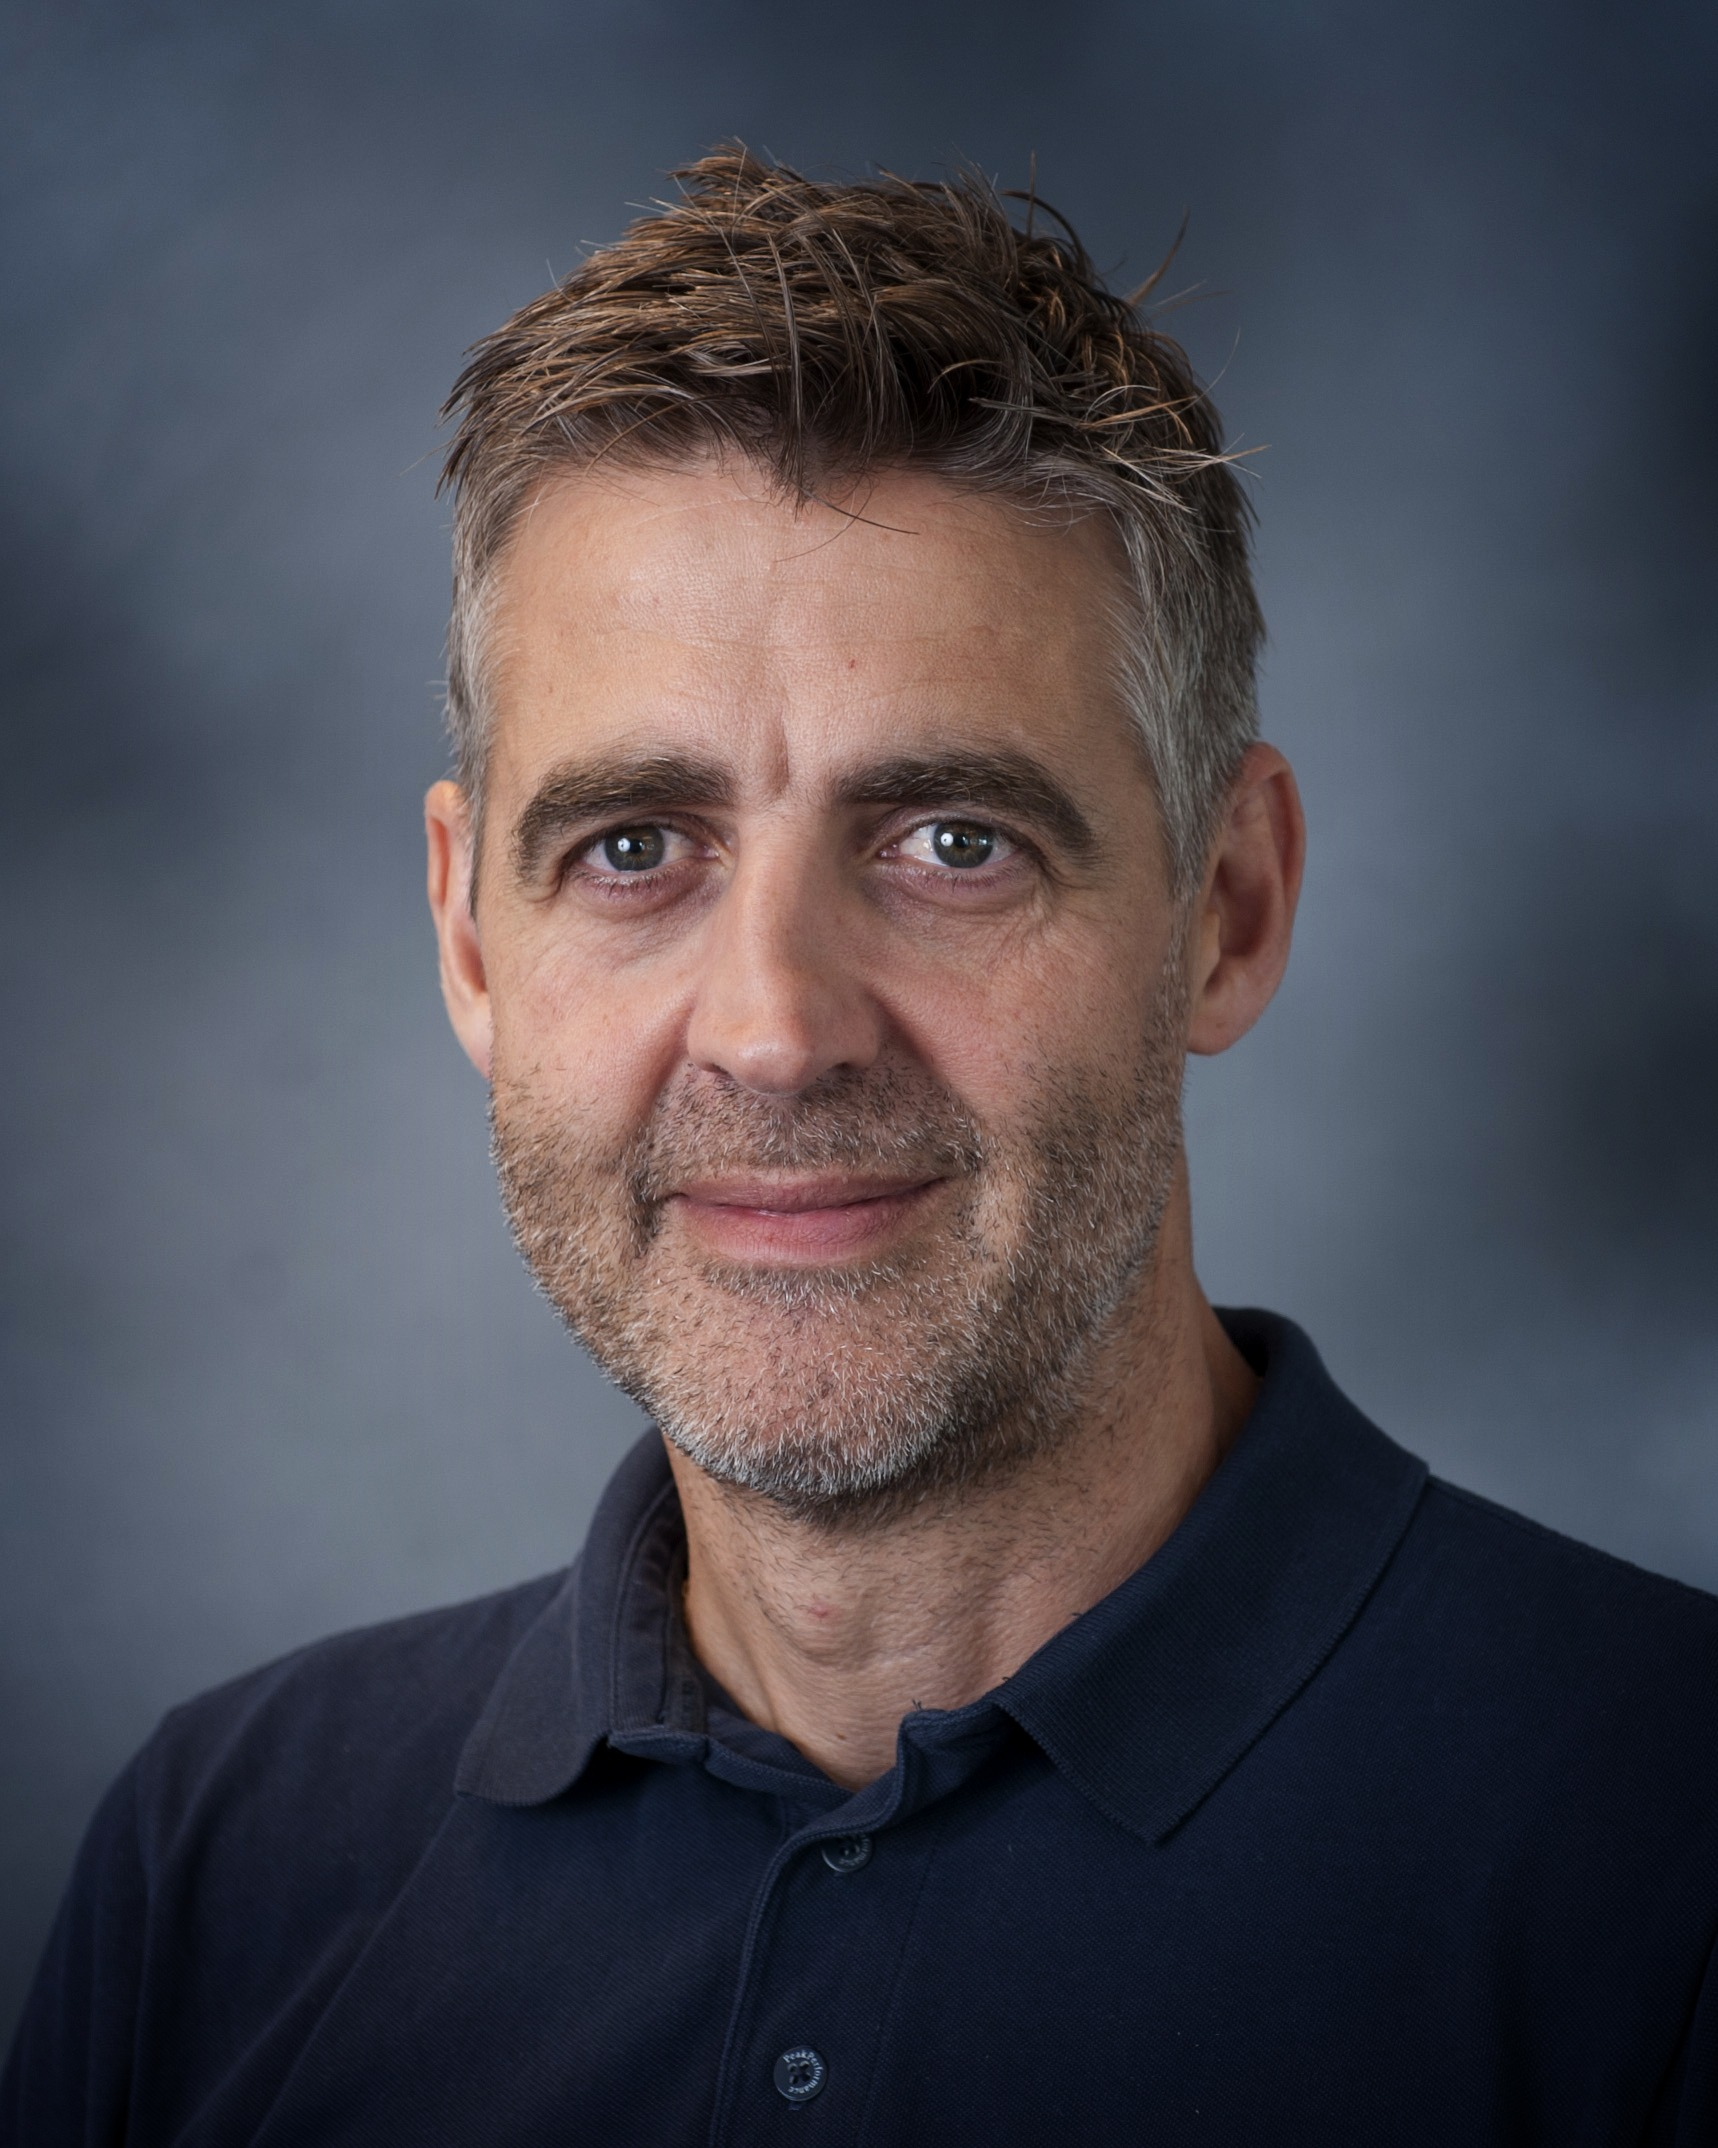 Jon Trygve Hagen